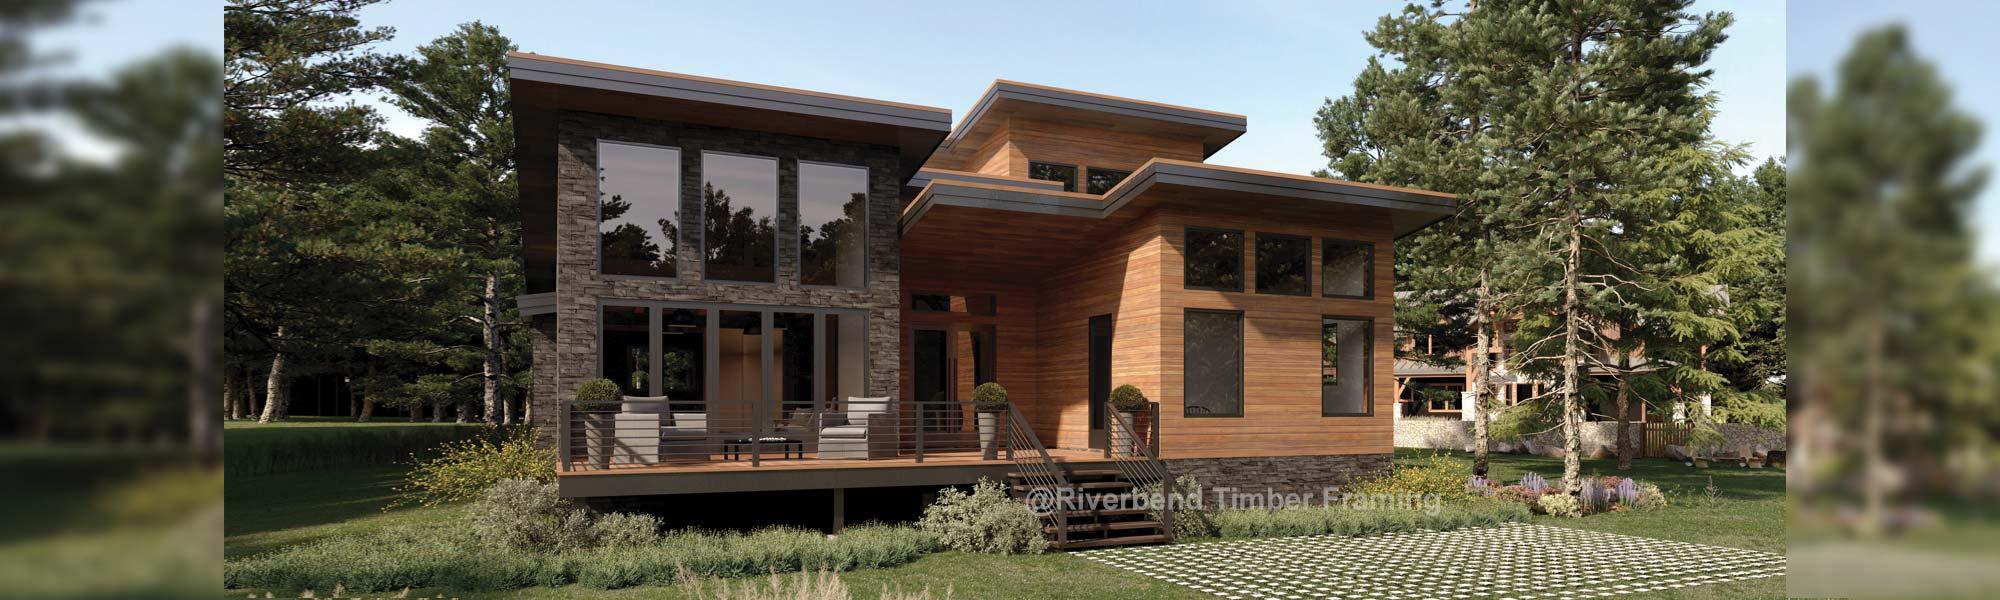 modern timber cabin